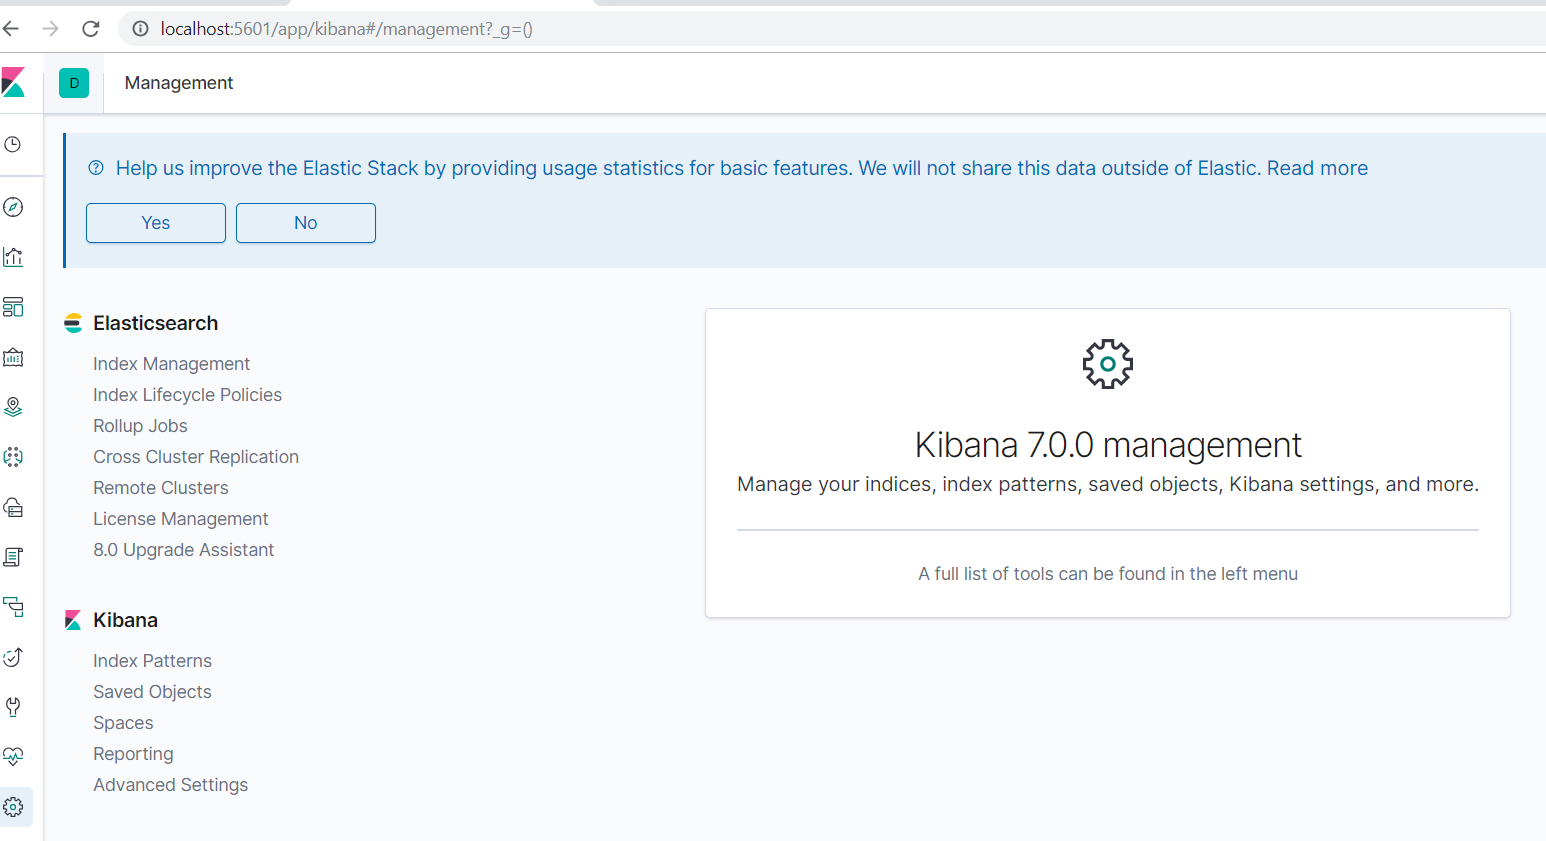 Logging Using Log4Net and gelf4net to ELK running on Docker via Udp